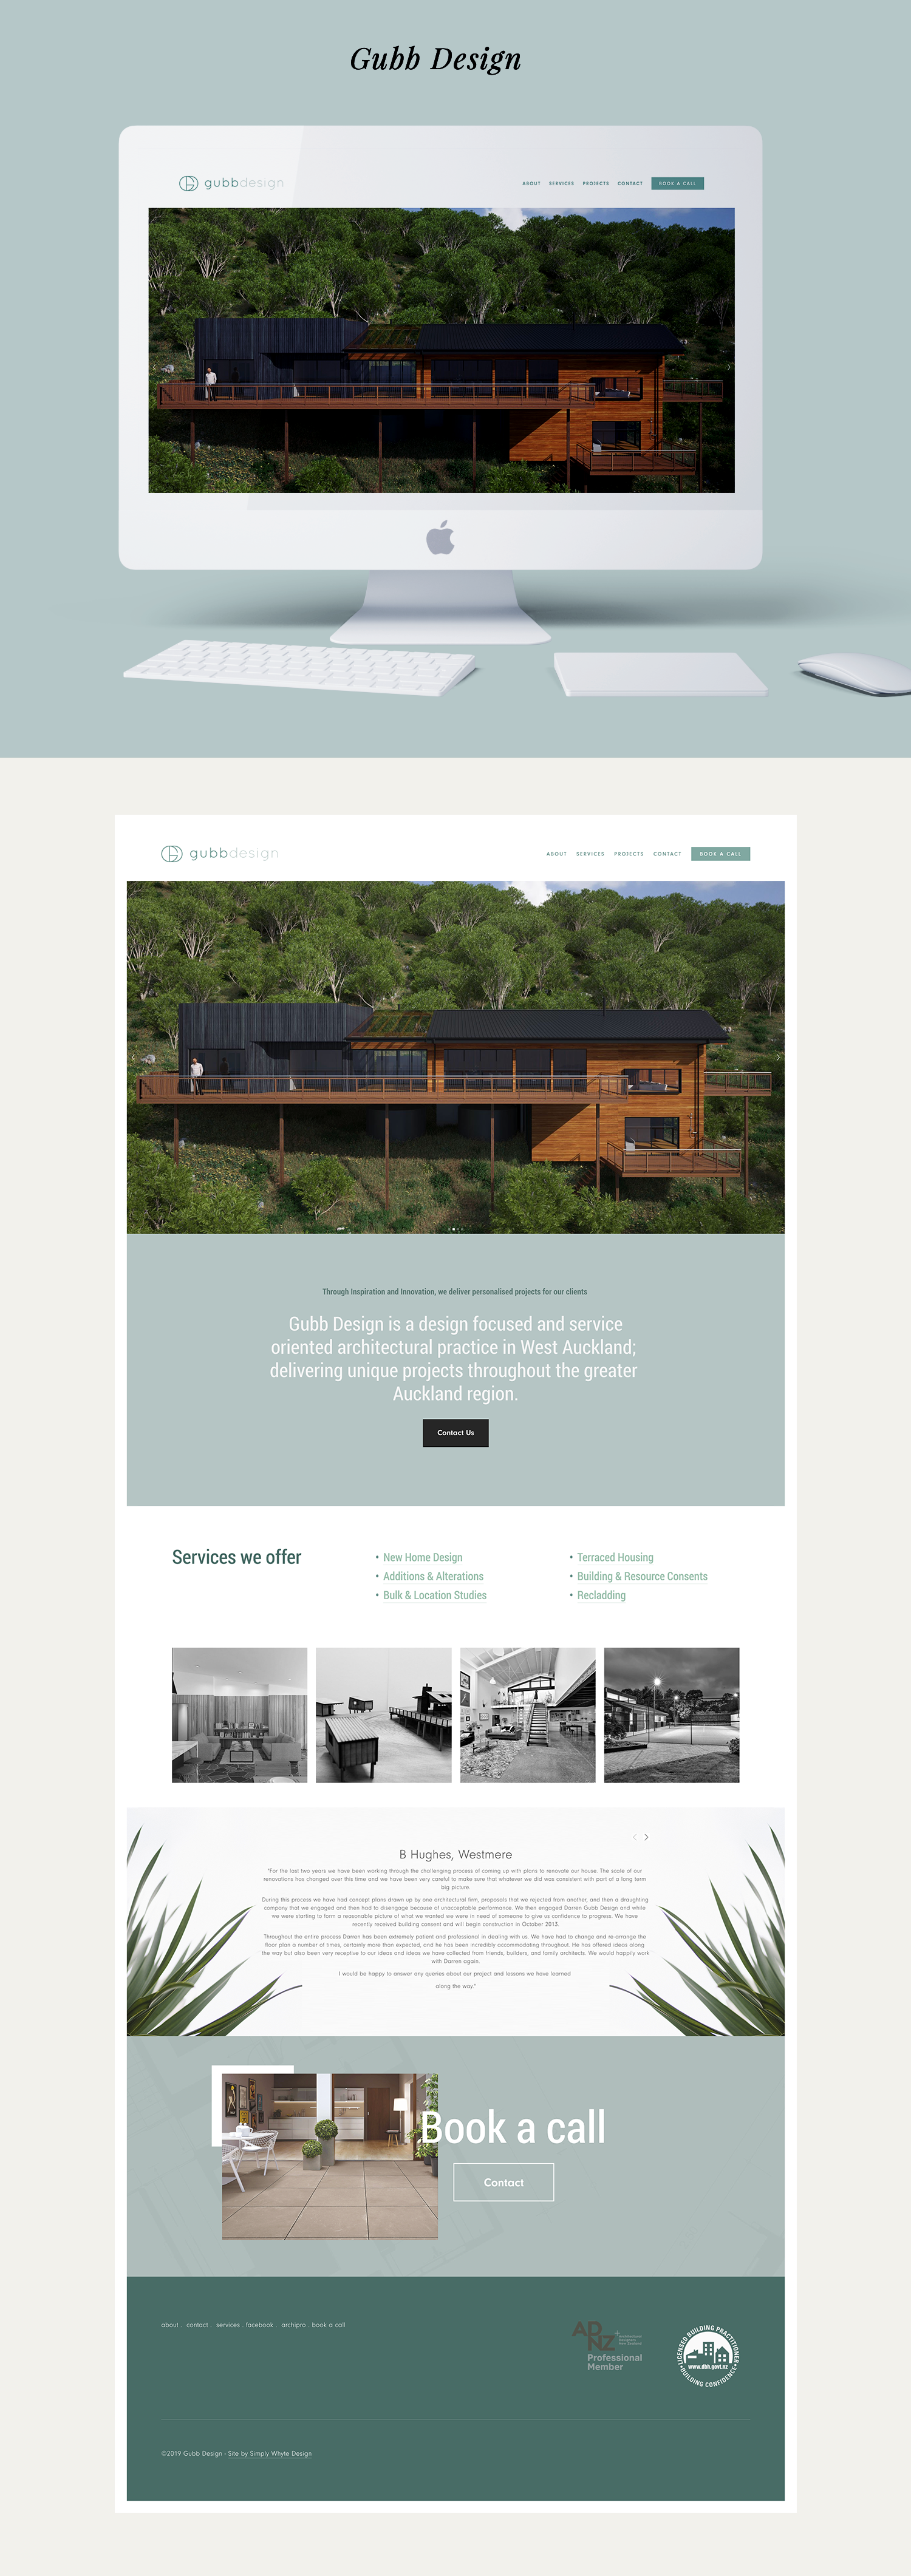 gubb design_simplywhytedesign_squarespace_websites_auckland_New_zealand